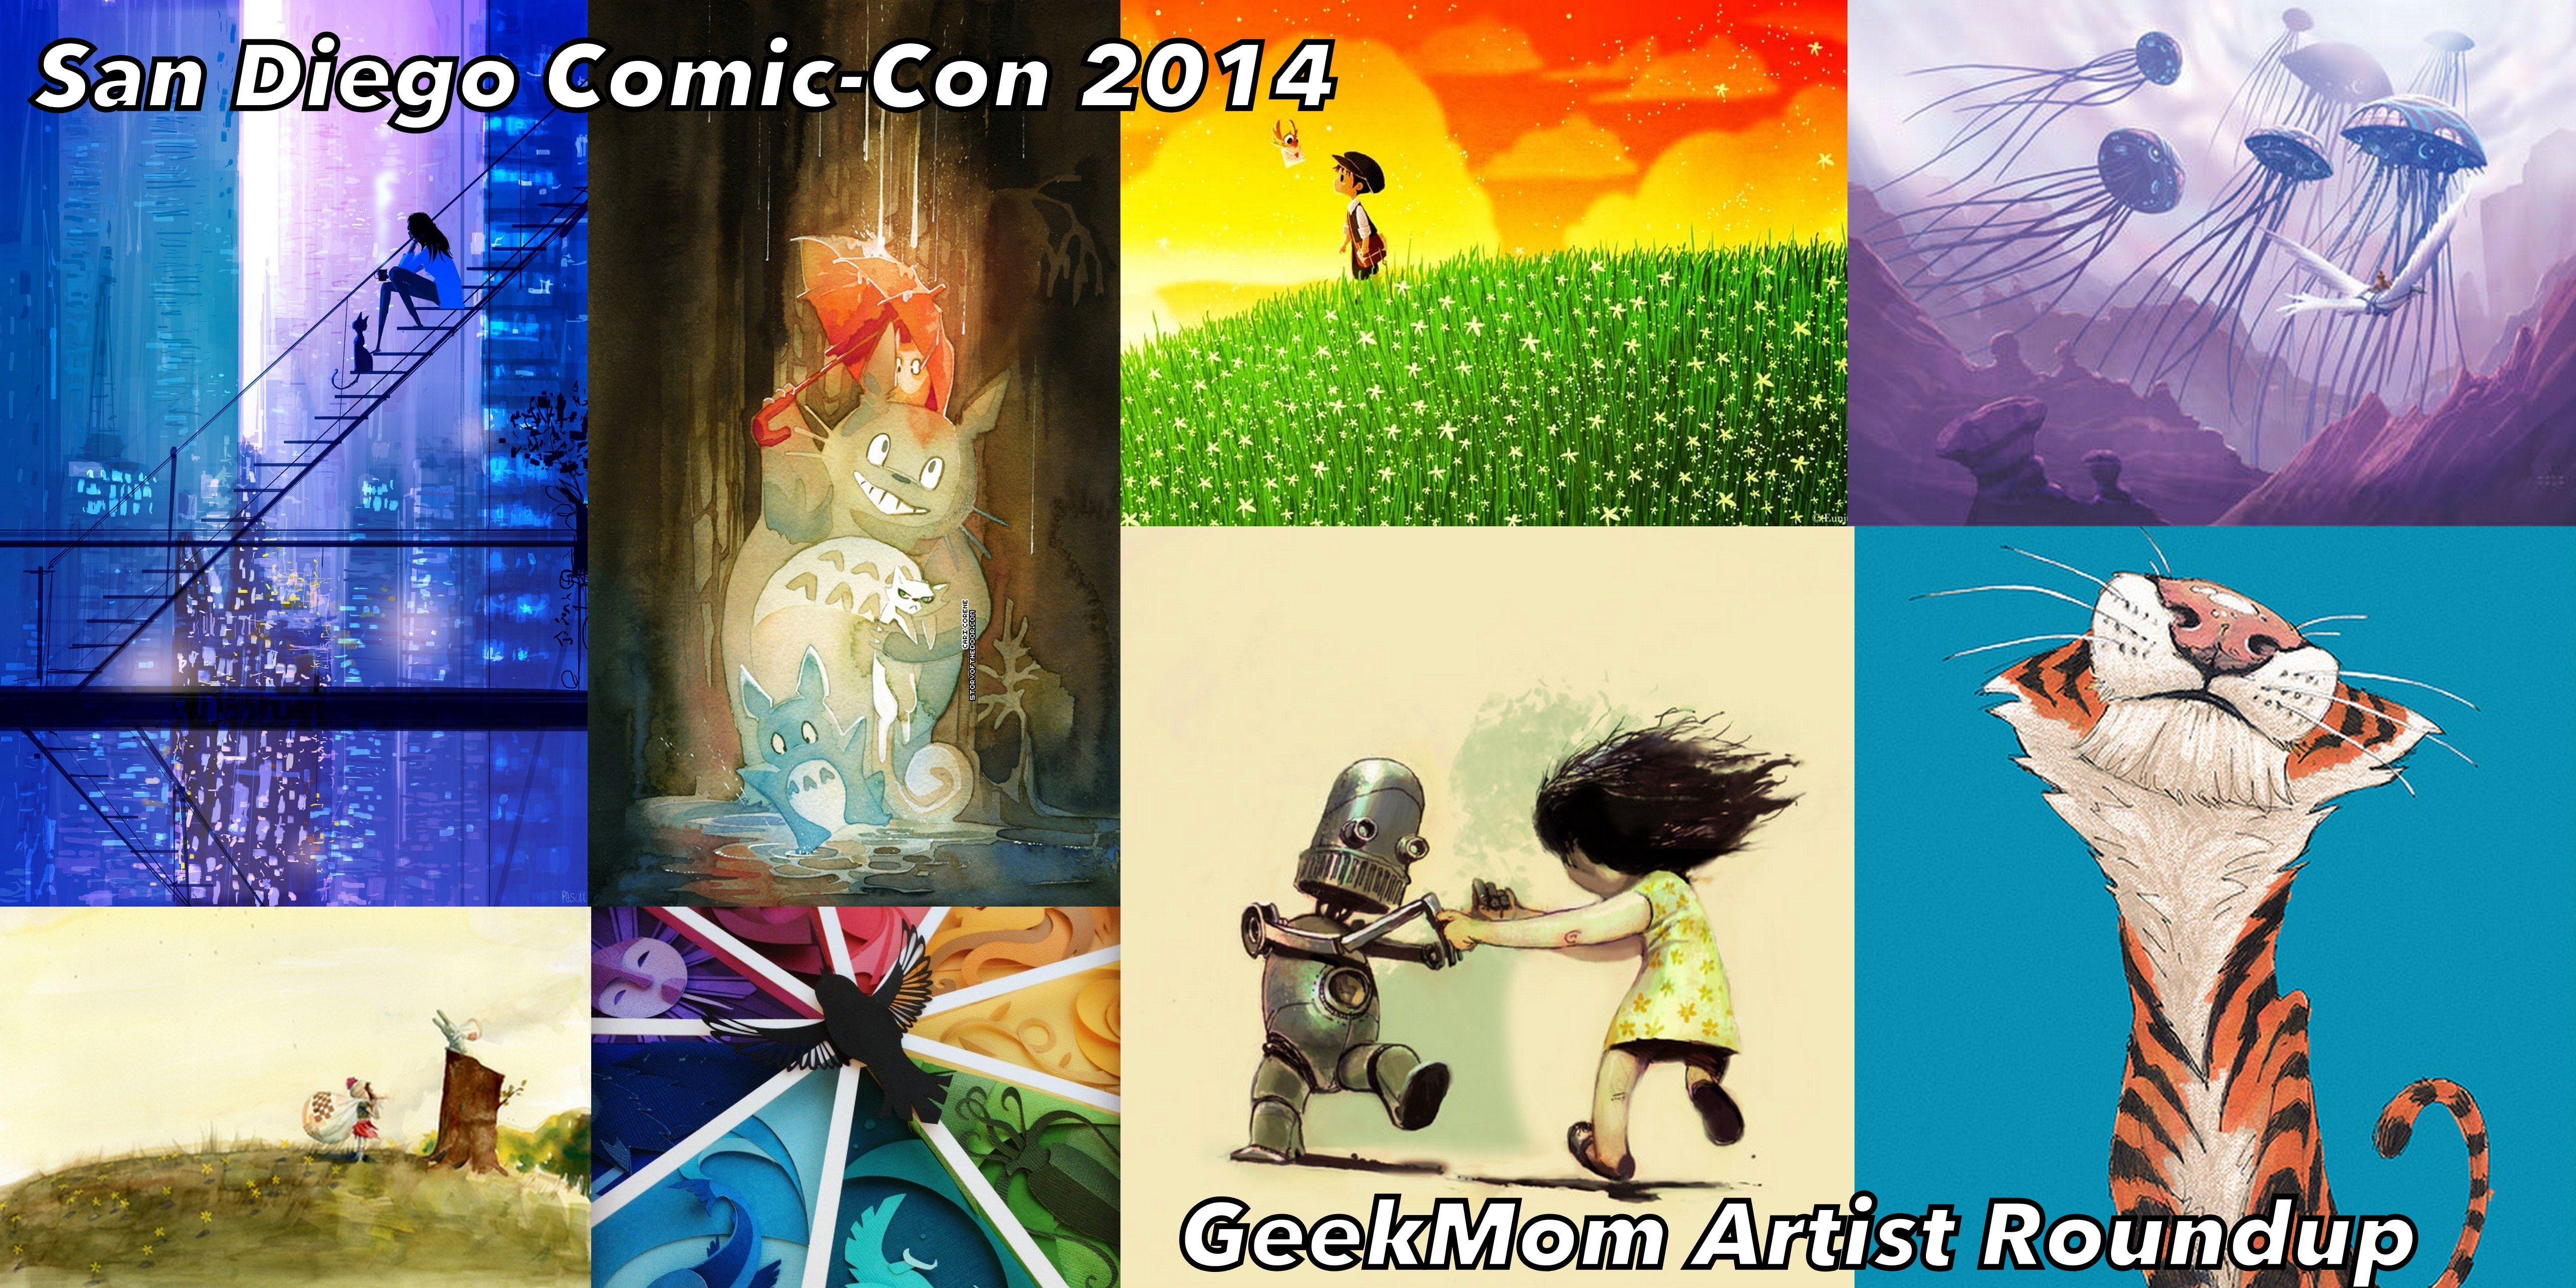 SDCC 2014: GeekMom Artist Roundup. Image credit: Ariane Coffin.